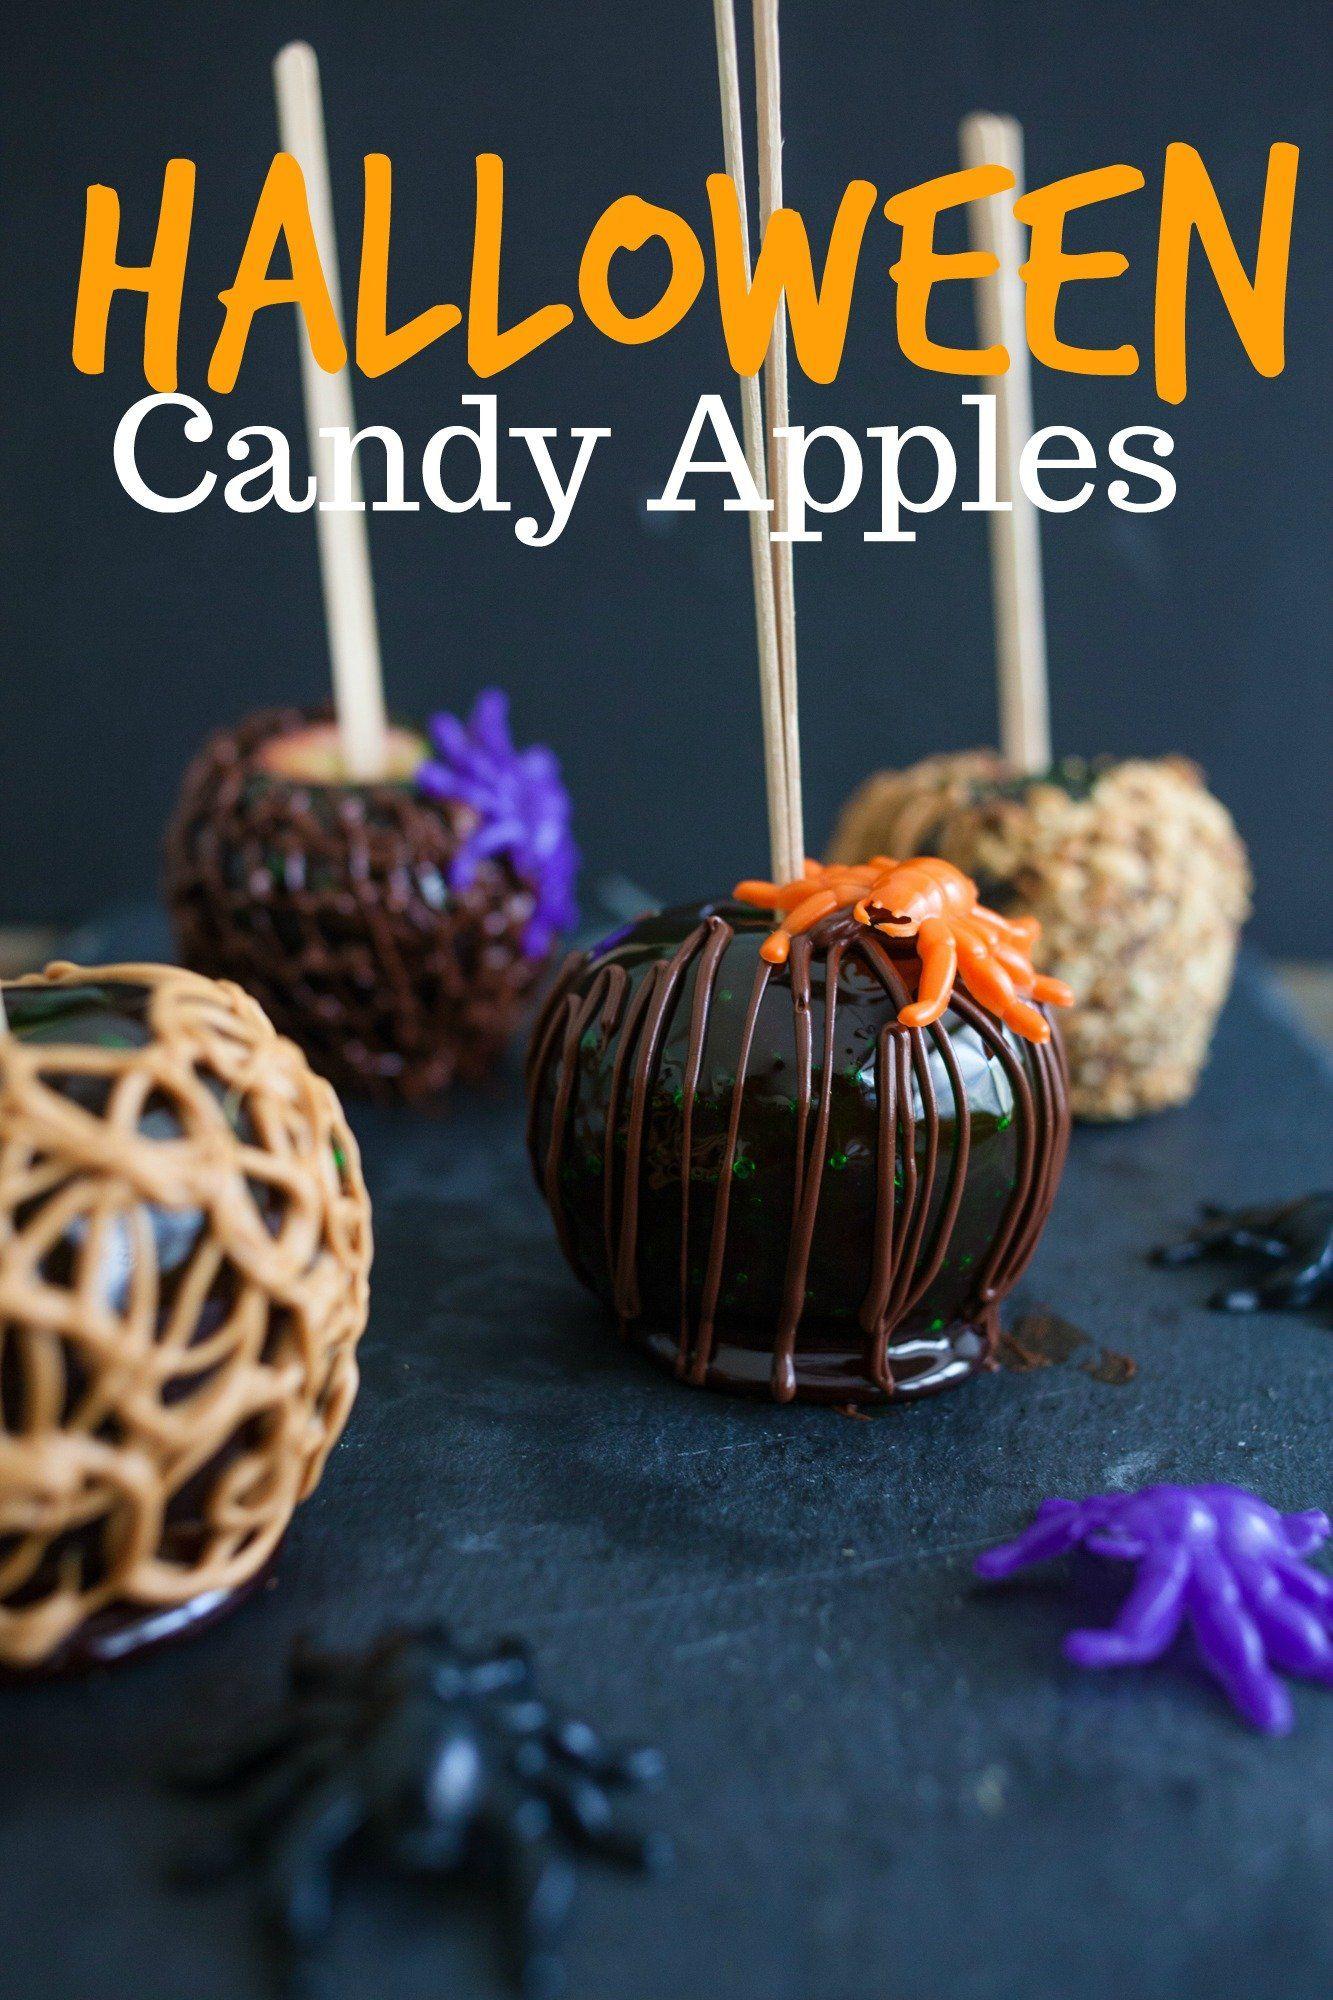 Halloween Candy Apples Halloween candy apples, Candy